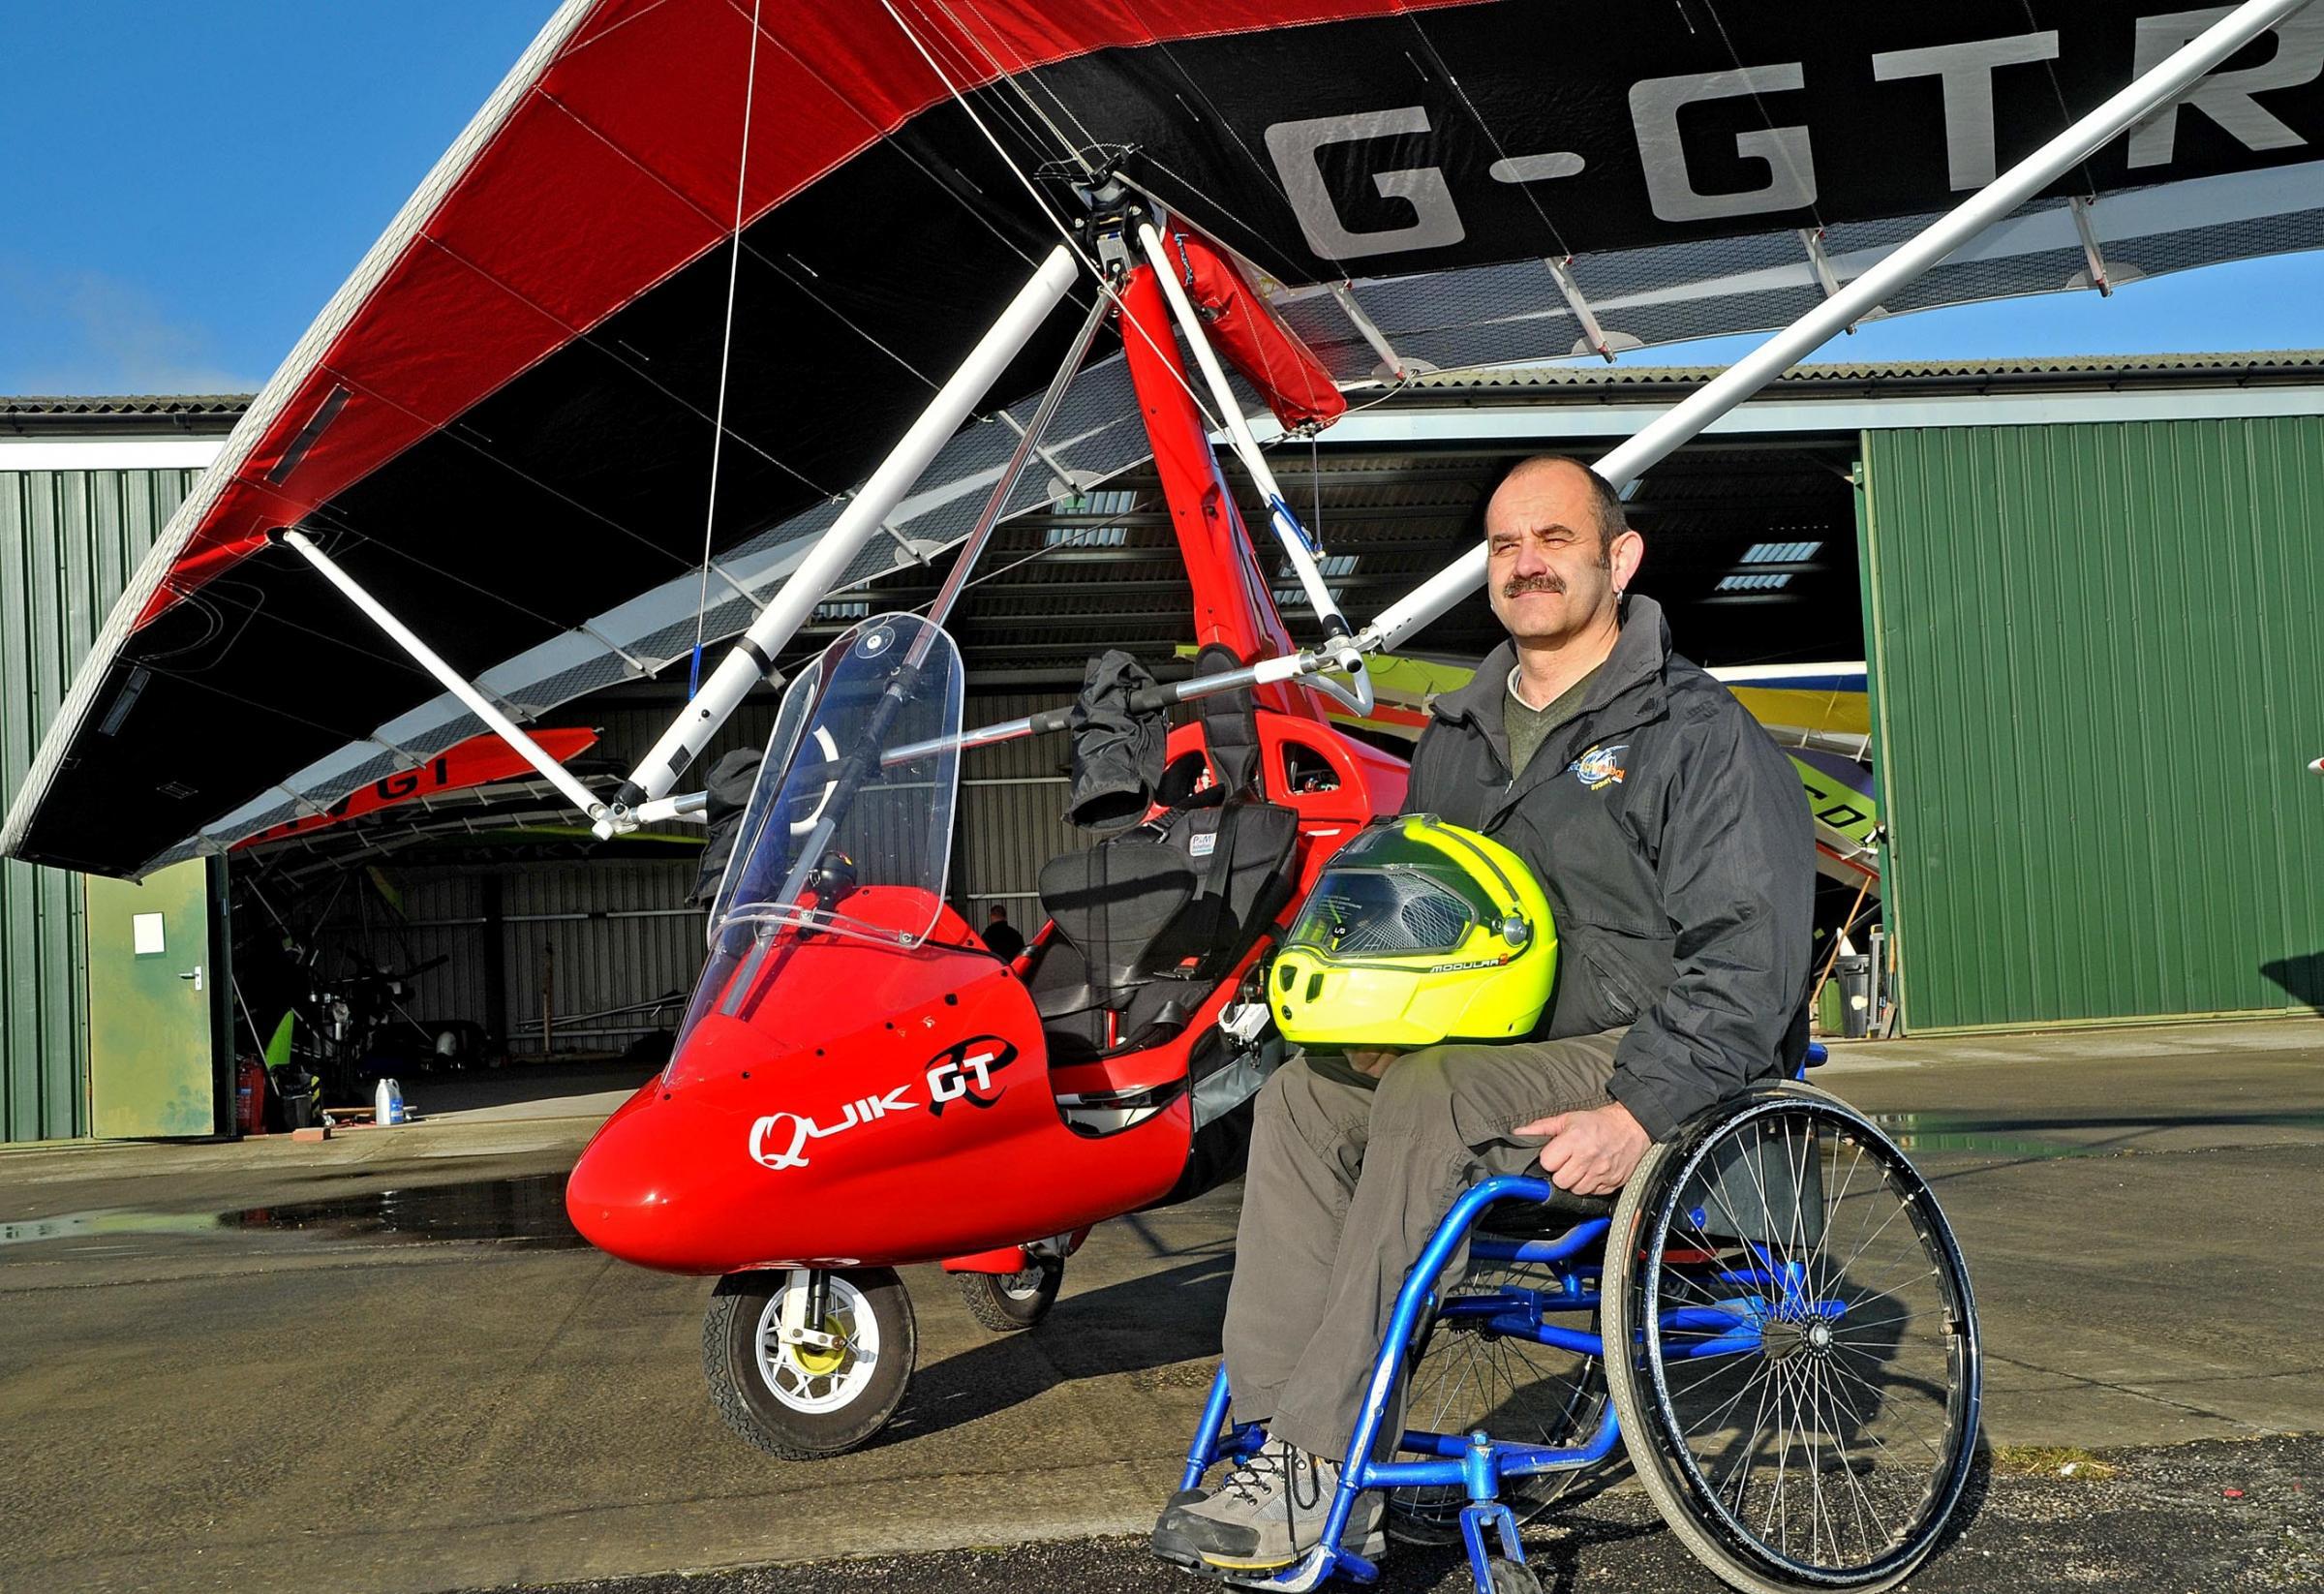 Dave Sykes, paraplegic Open cockpit microlight pilot